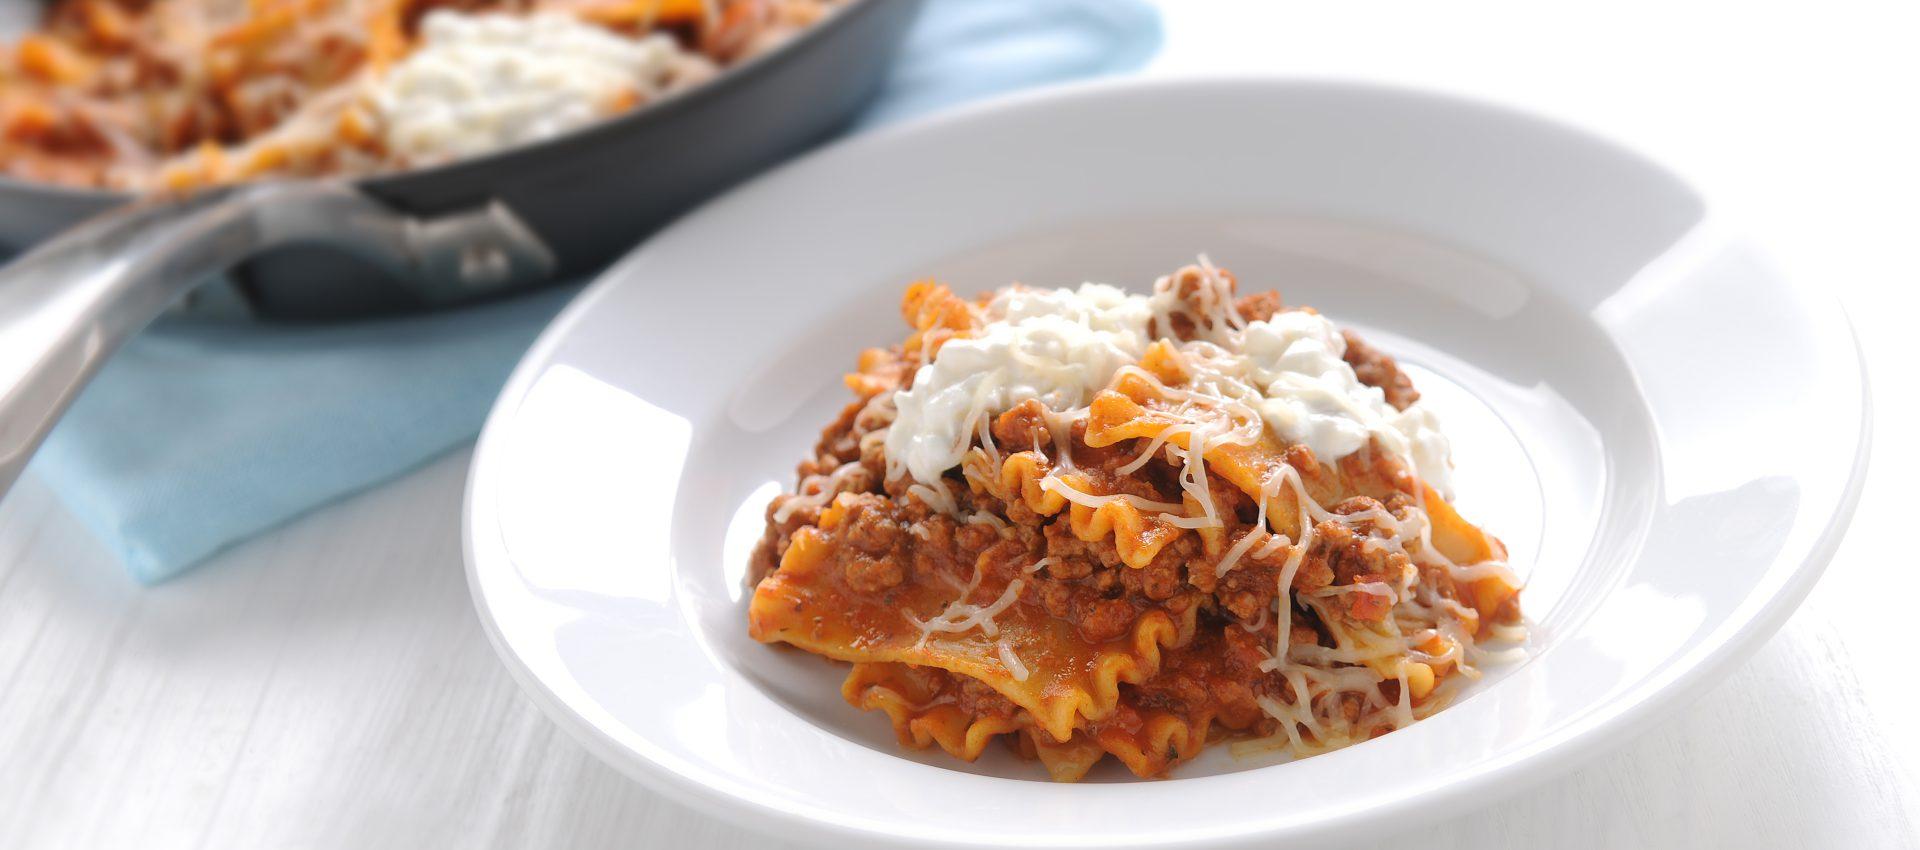 Italian skillet lasagna with ground beef, pasta sauce, ricotta, and Italian shredded cheese